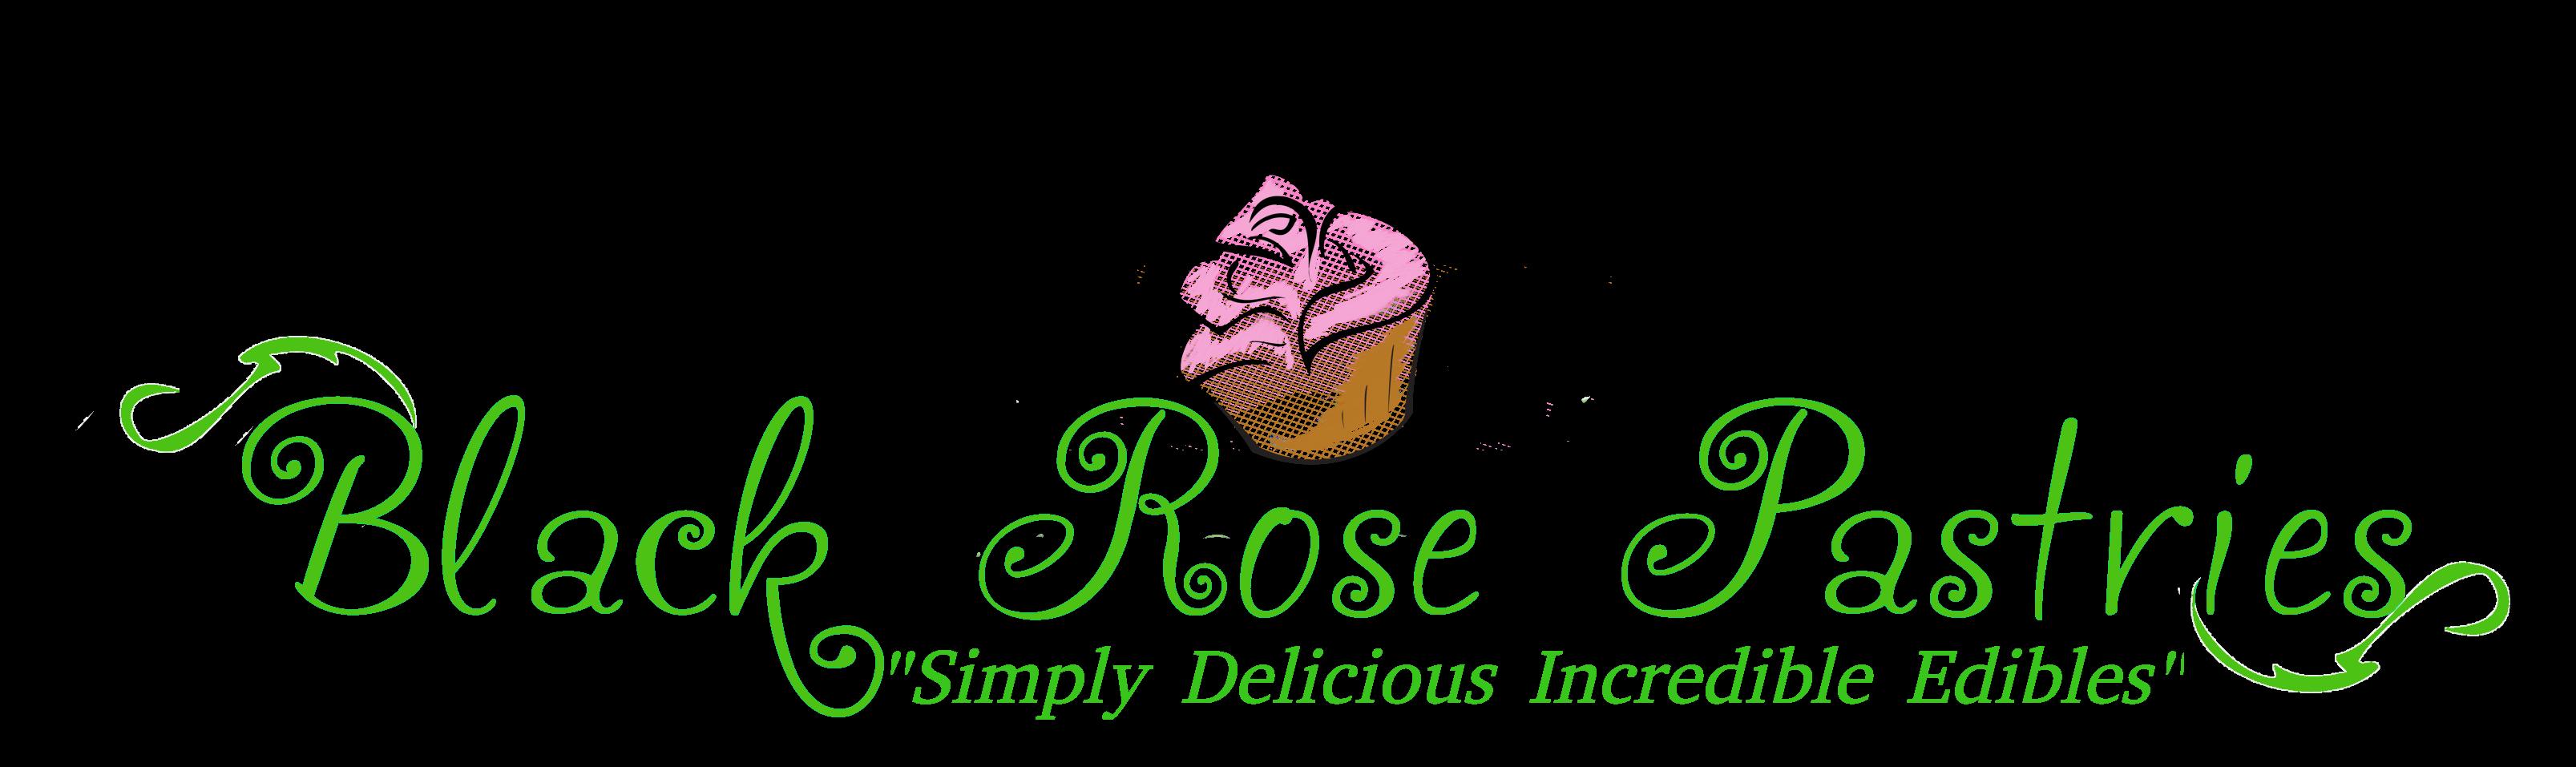 Chicago Bakery Black Rose Pastries